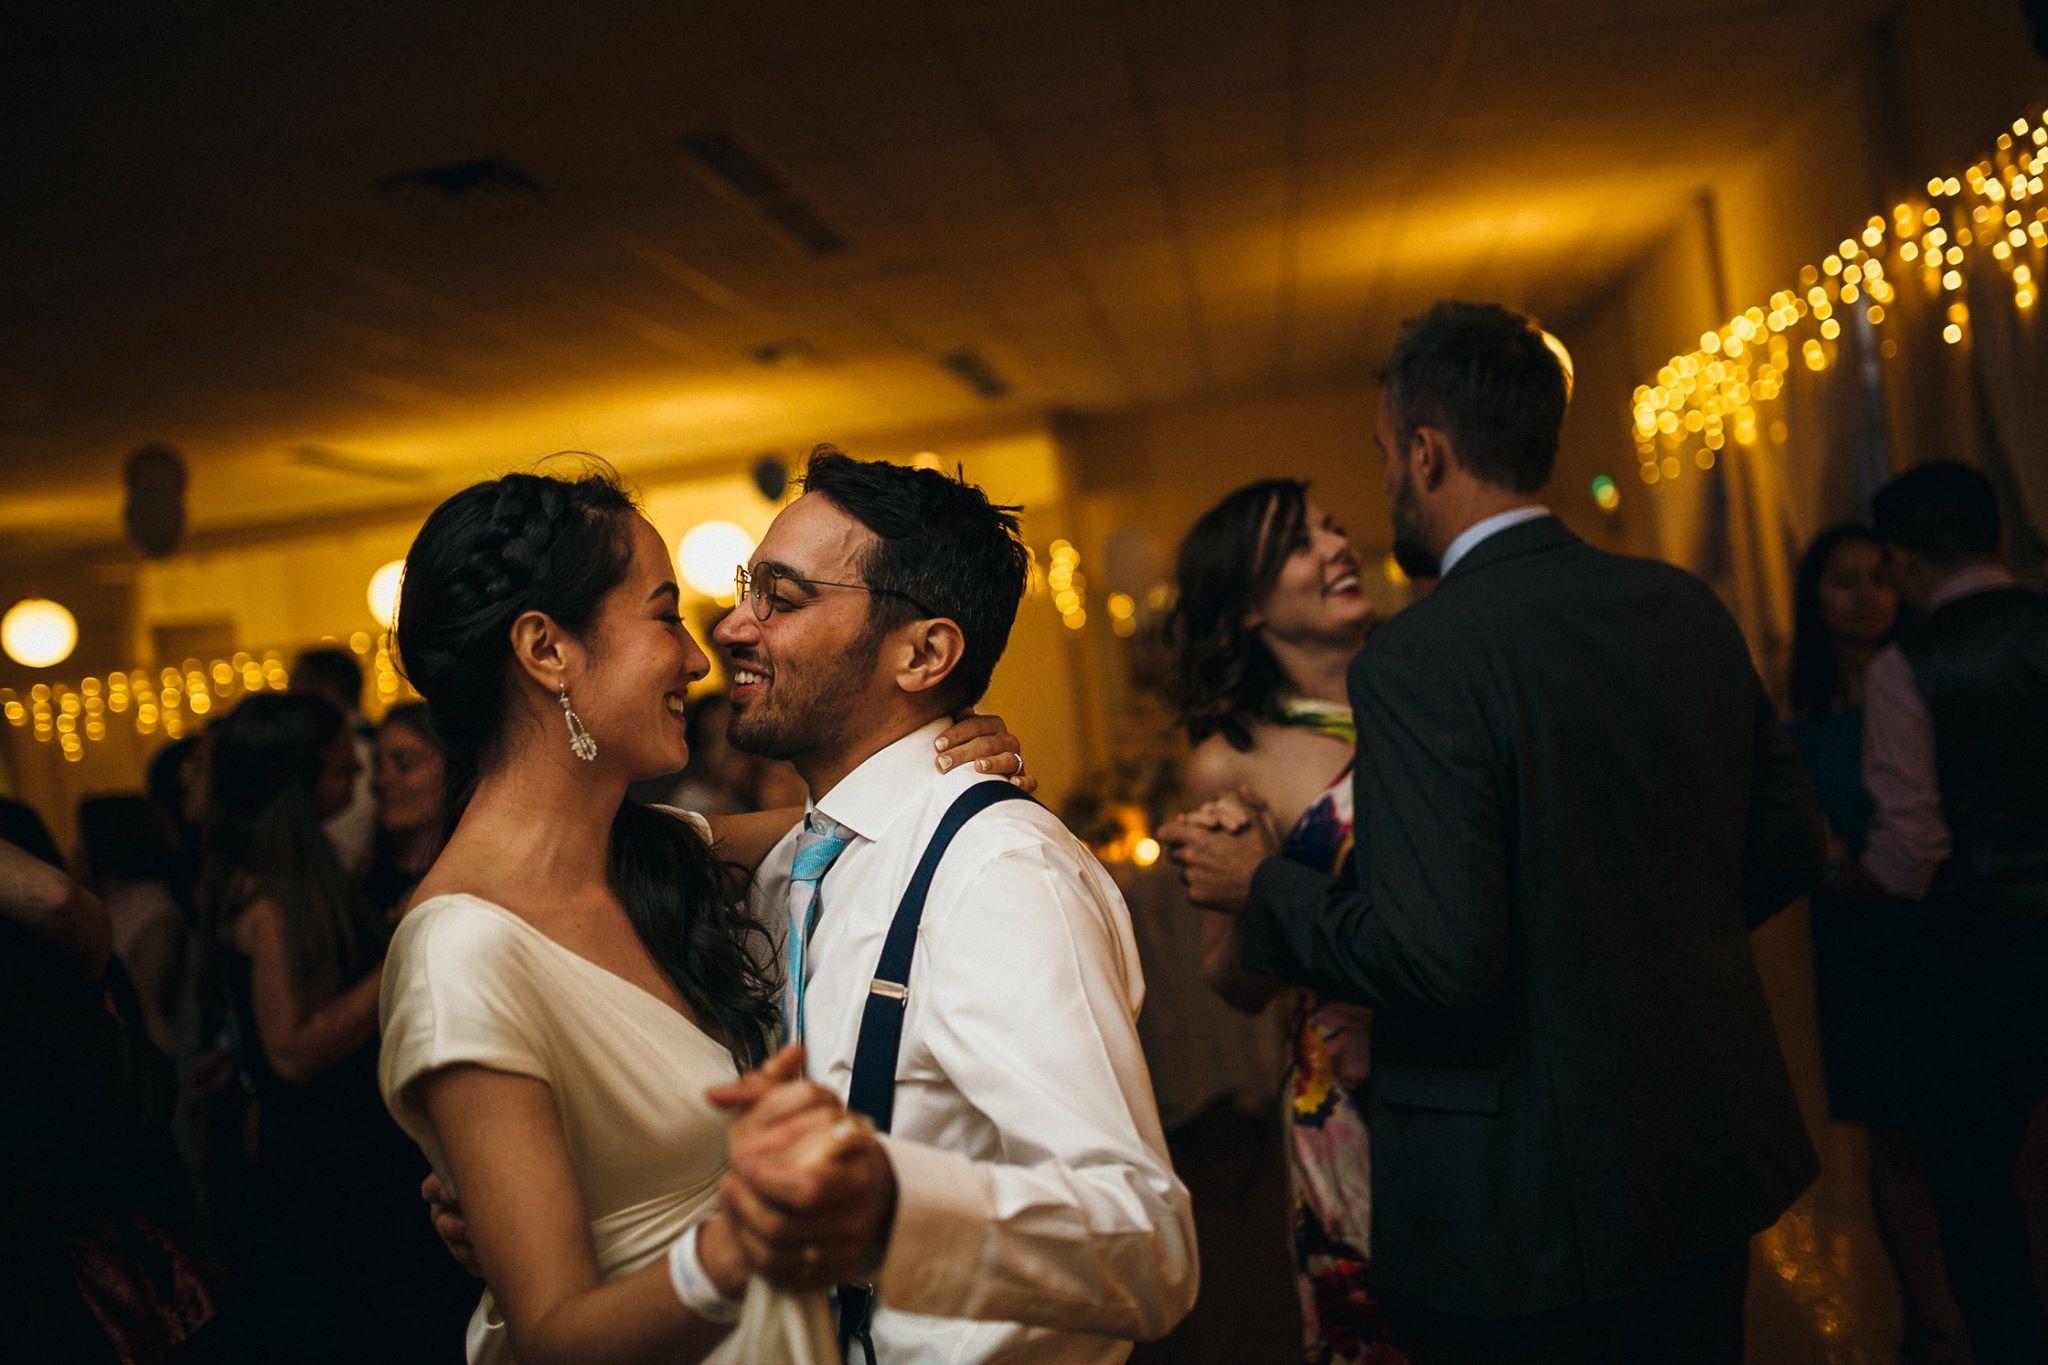 candidi wedding photographer.jpg